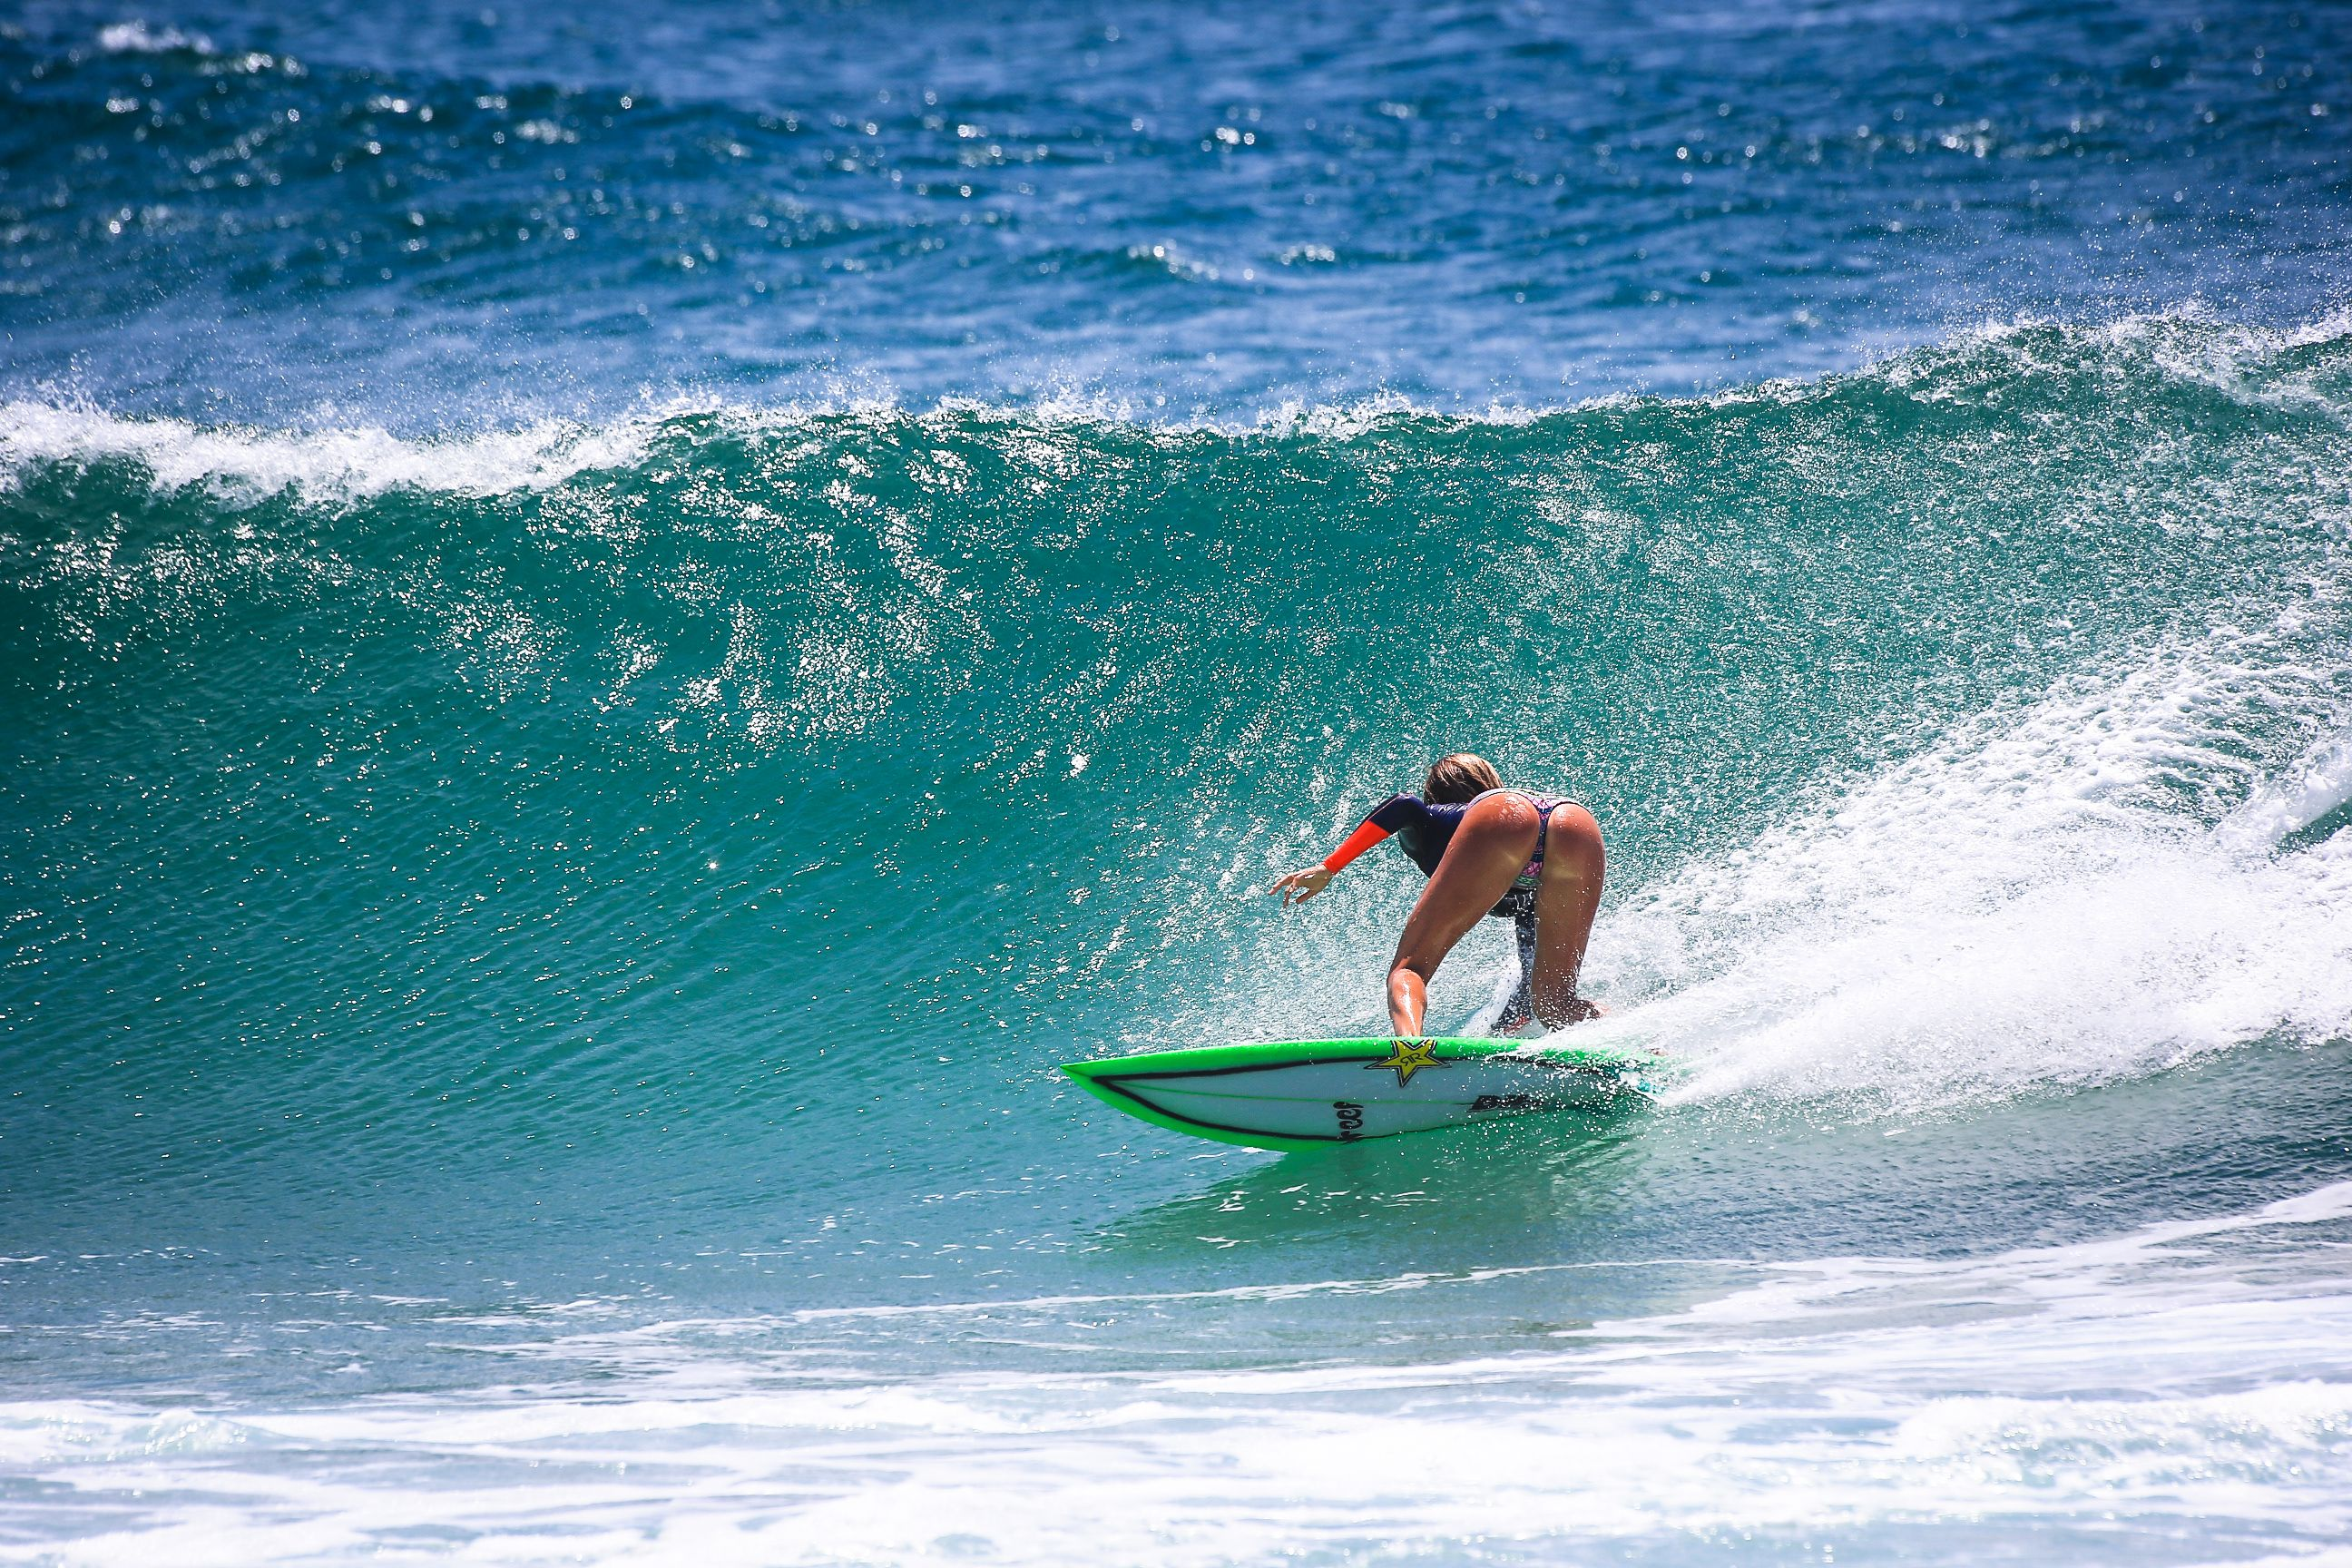 Alana Blanchard - Surf - Rockstar Energy Drink | Chicks & Rides ...